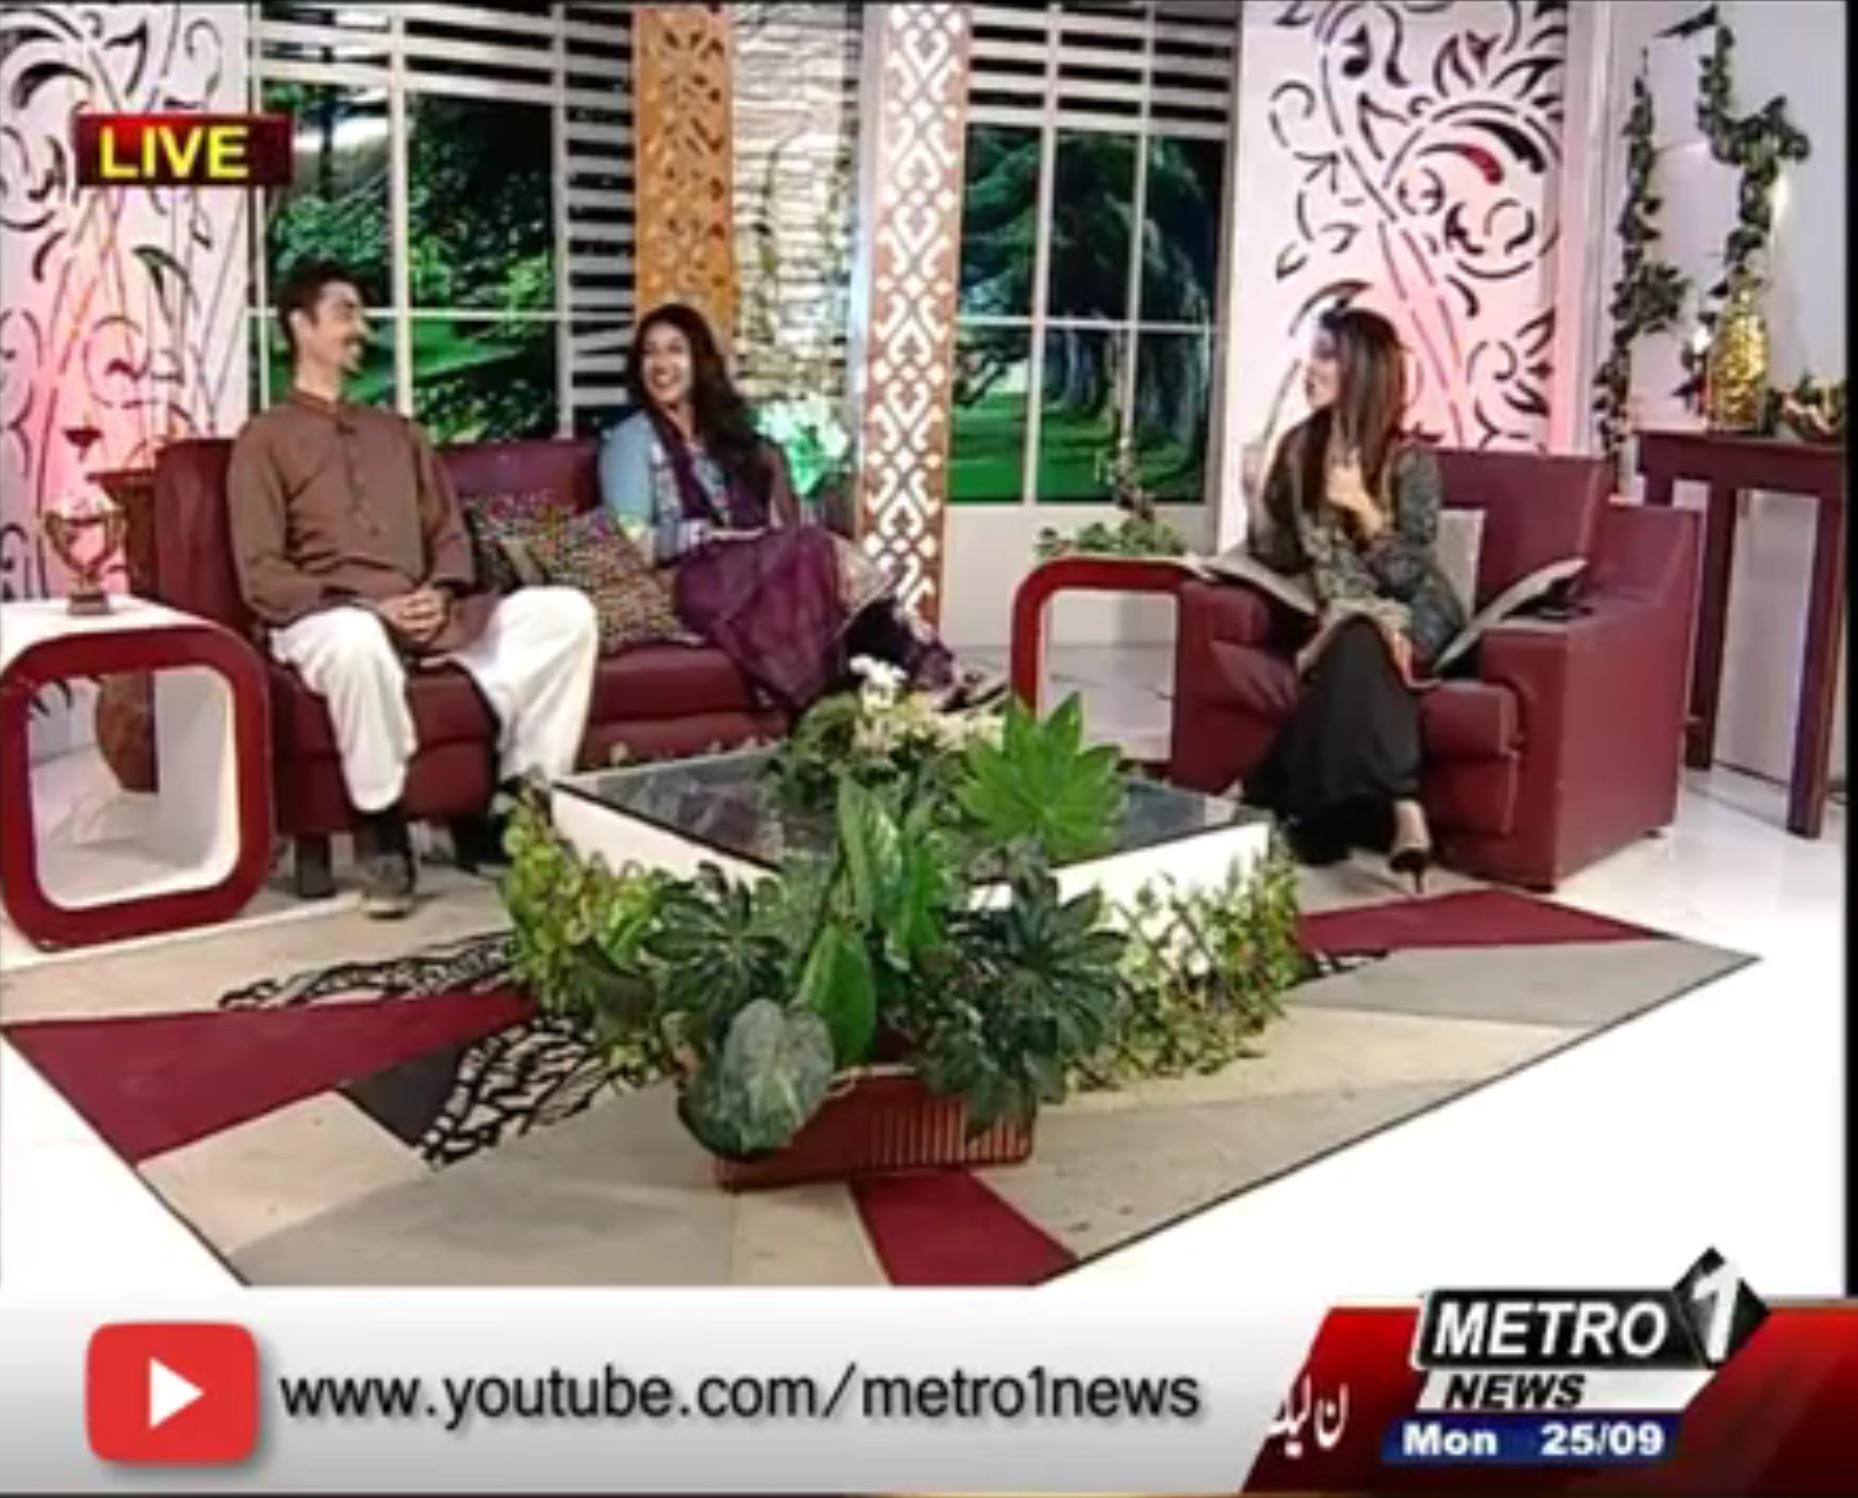 Metro1News